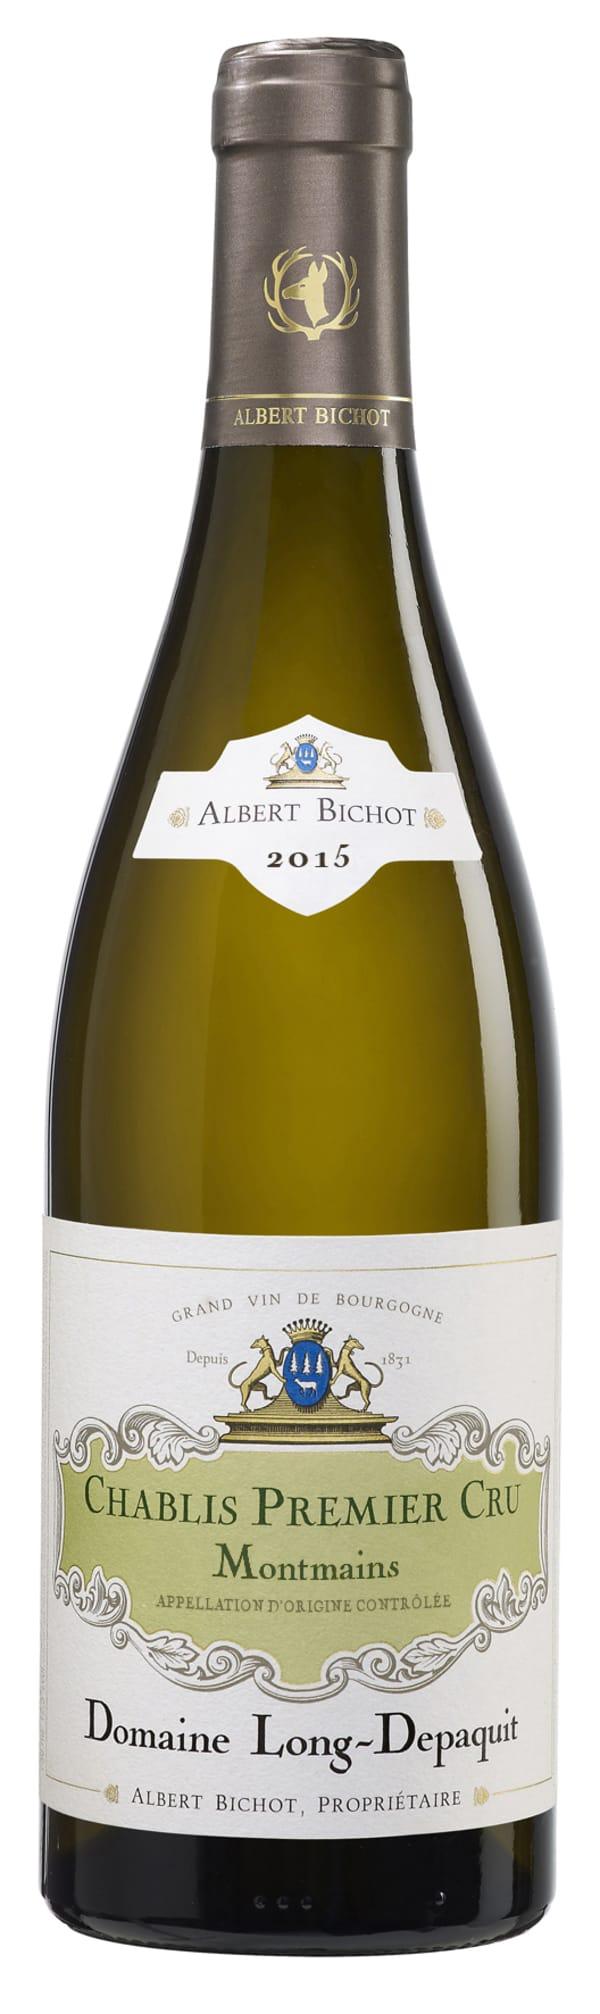 Albert Bichot Domaine Long-Depaquit Chablis 1er Cru Montmains 2015